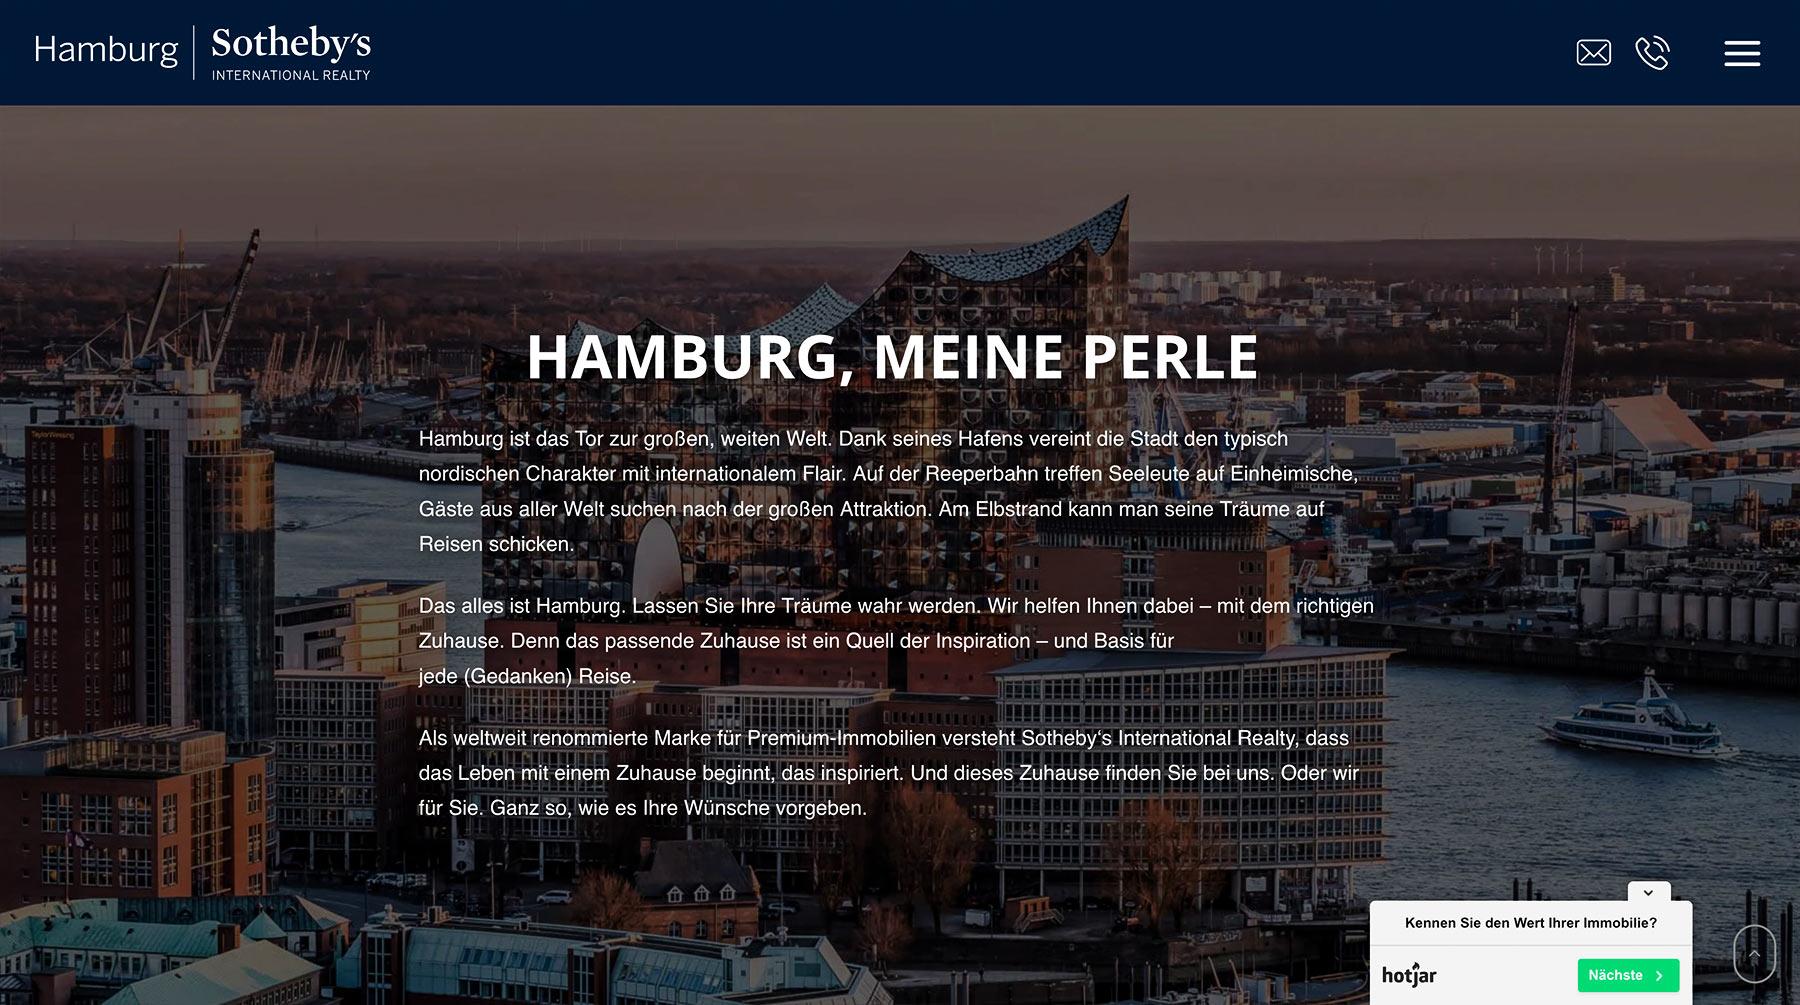 hamburg-sothebys6